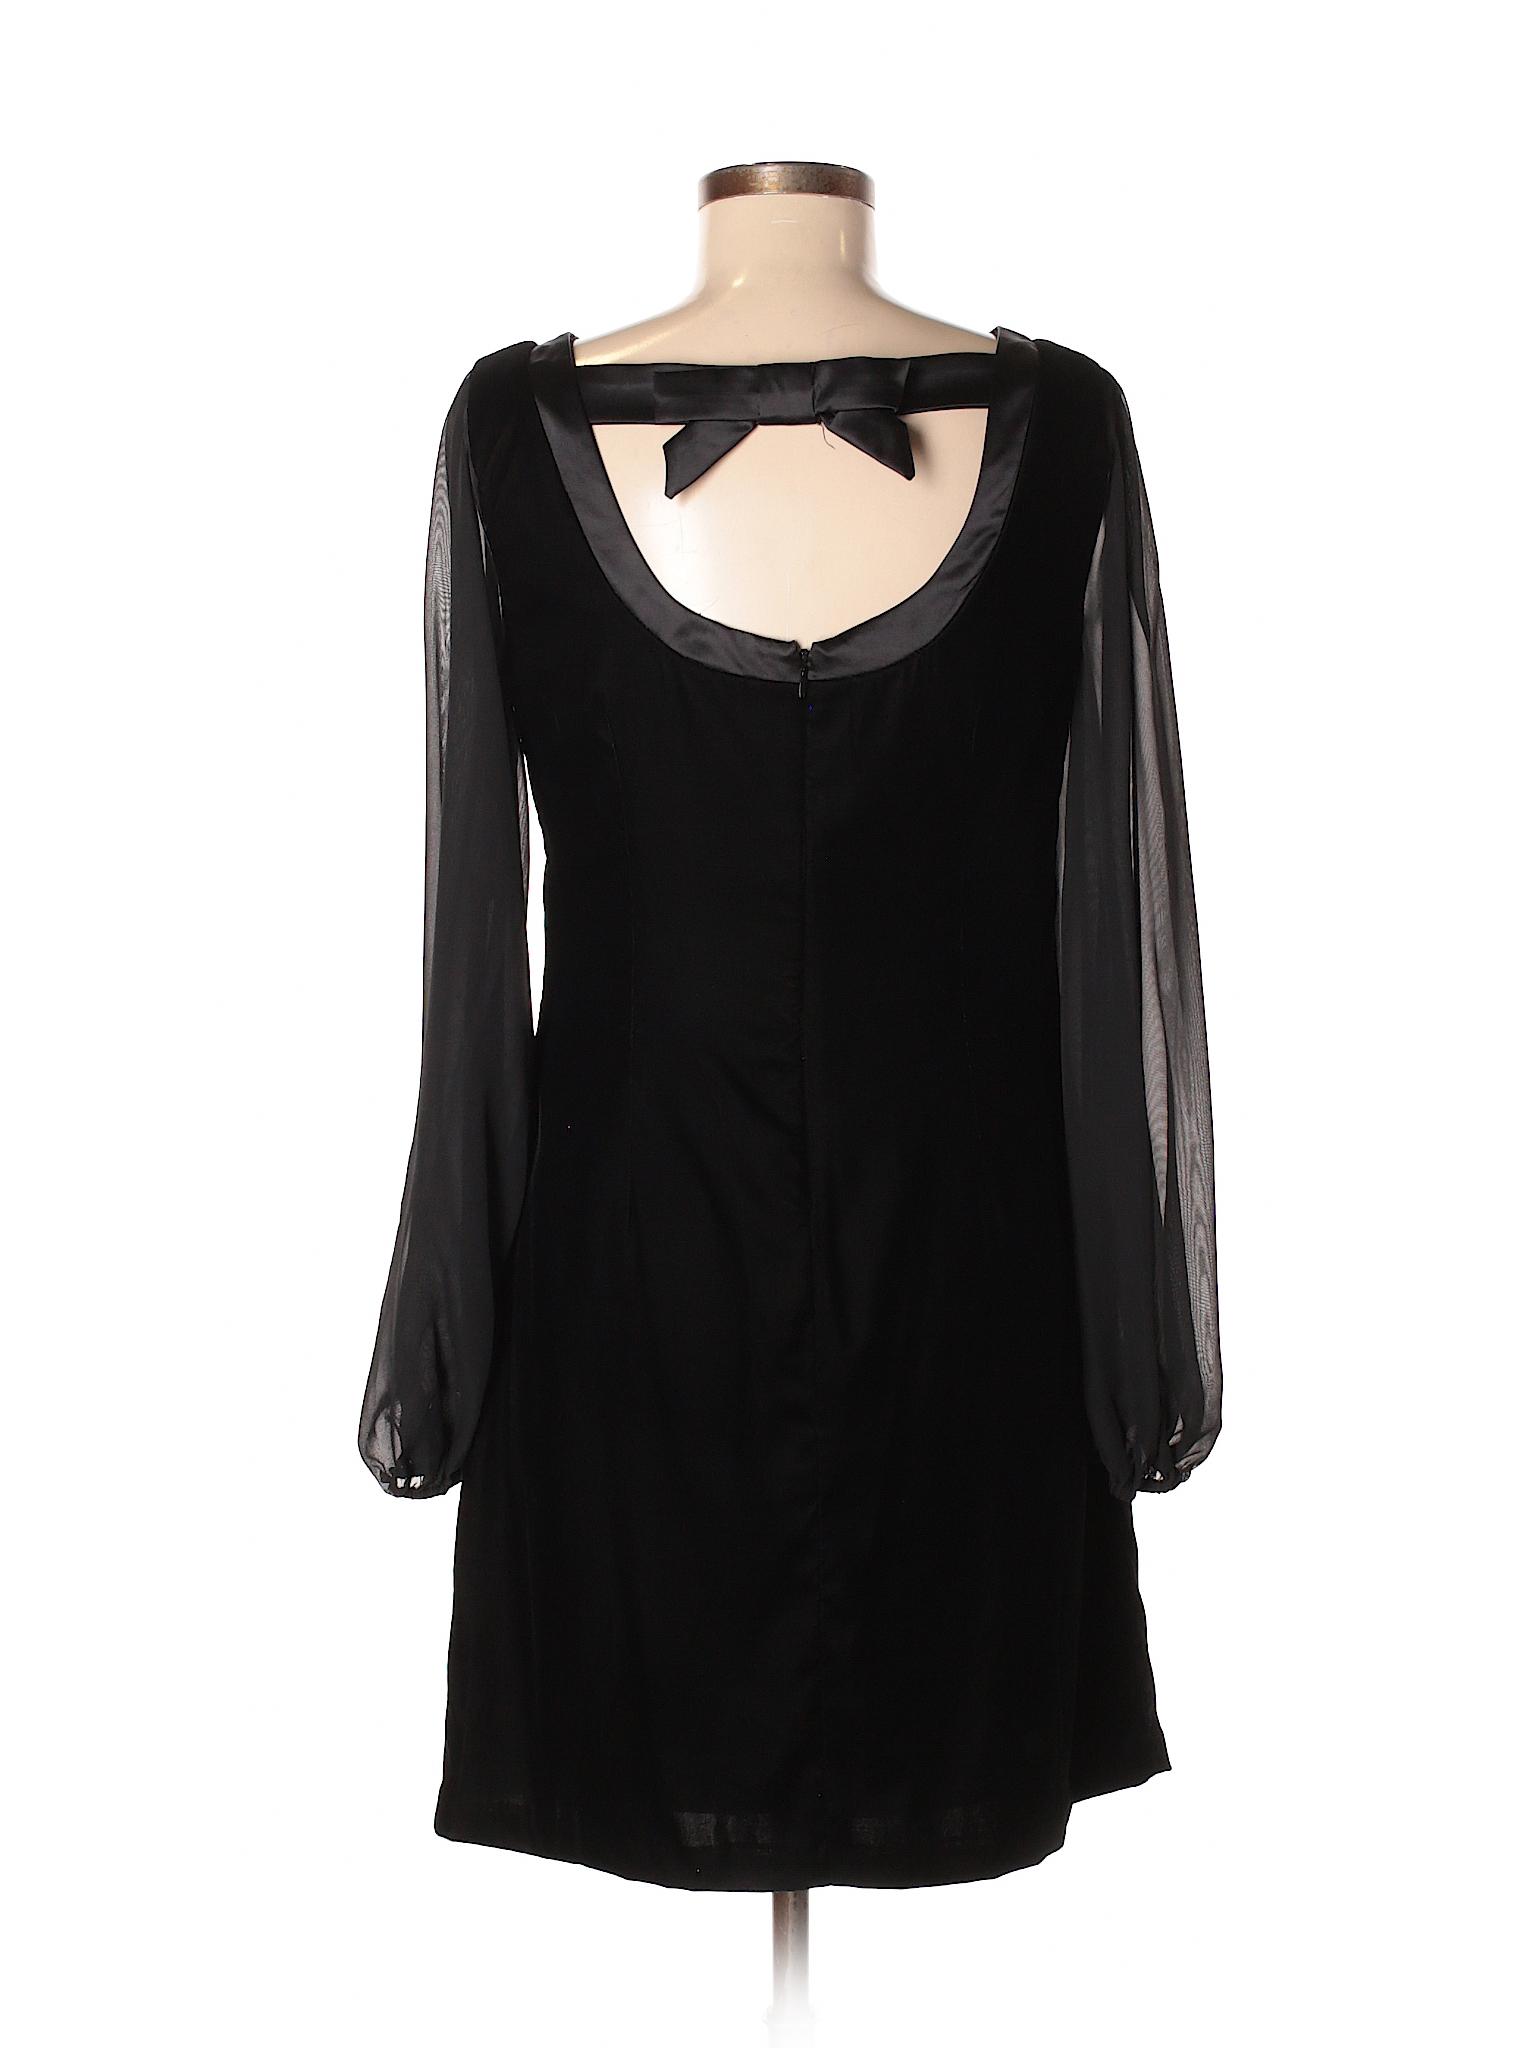 Black Dress Boutique White Market winter House Casual tF1HA